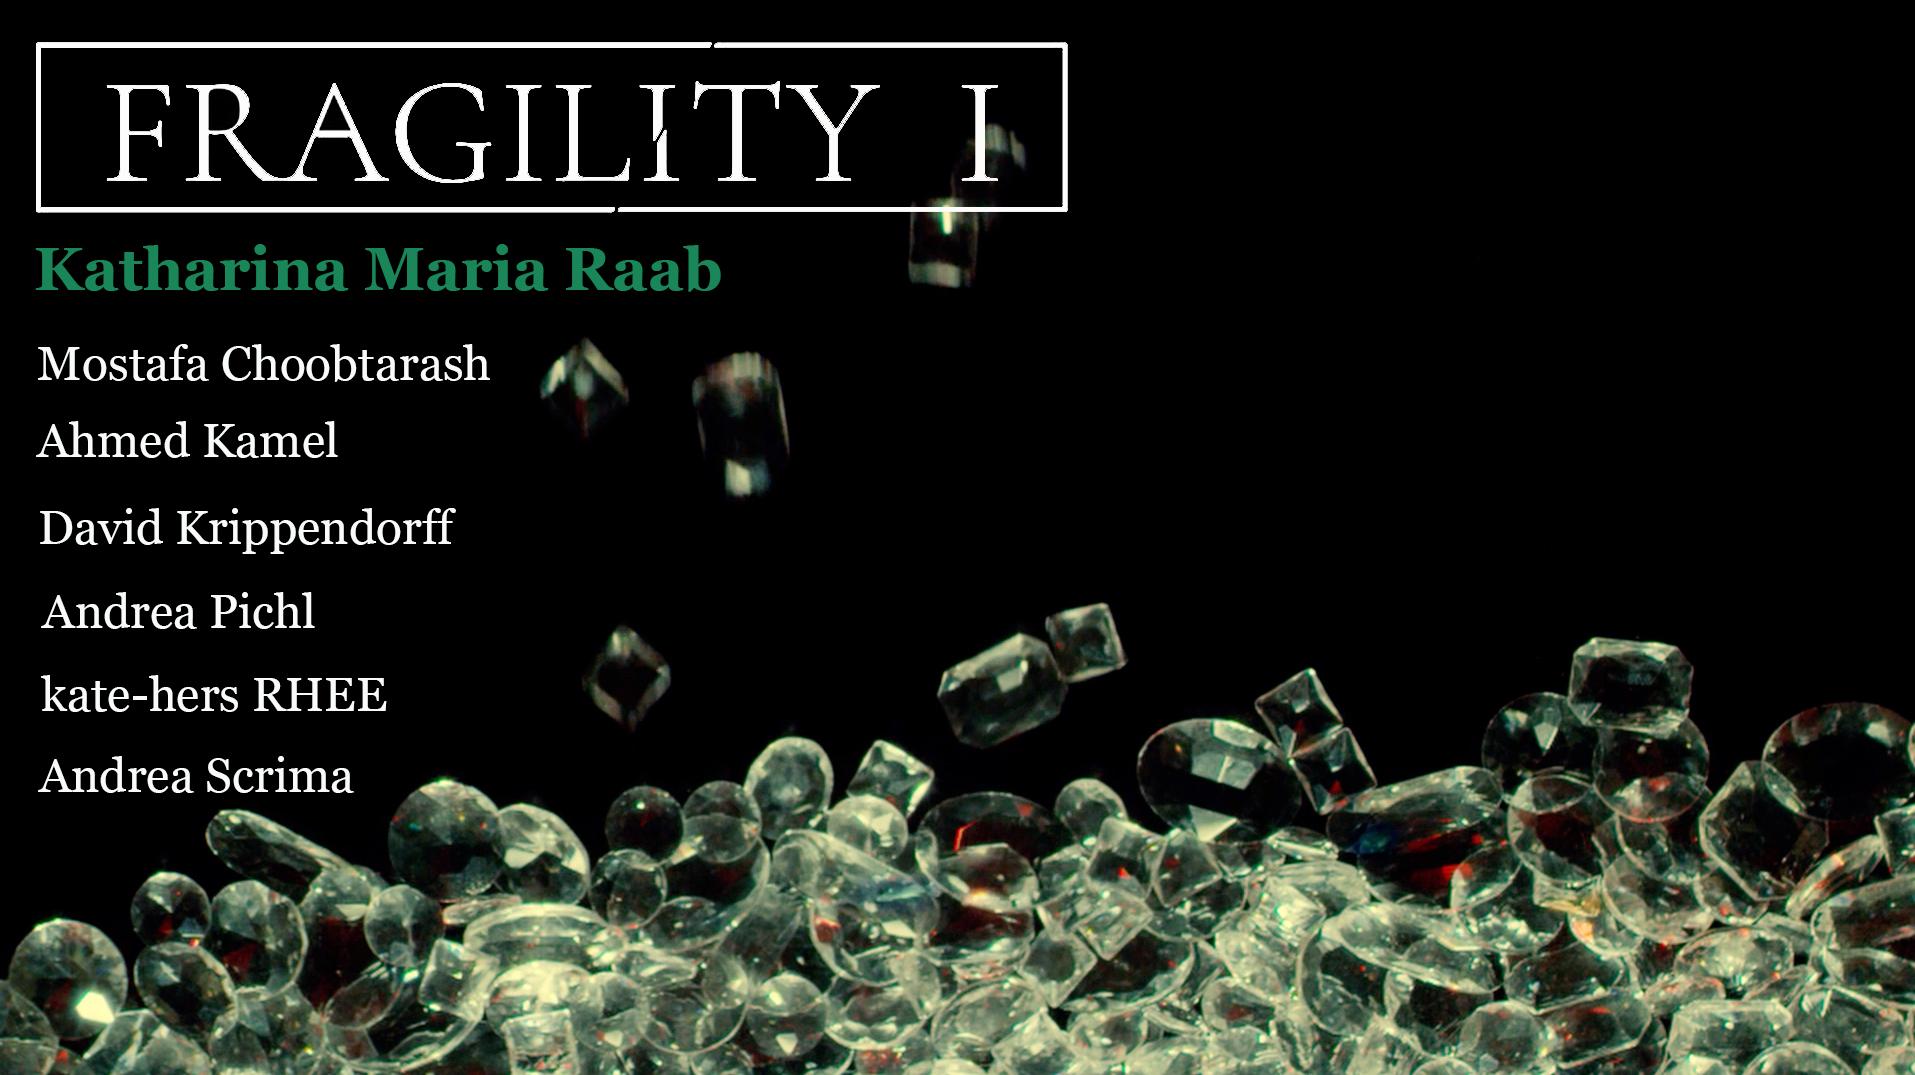 FRAGILITY1_website